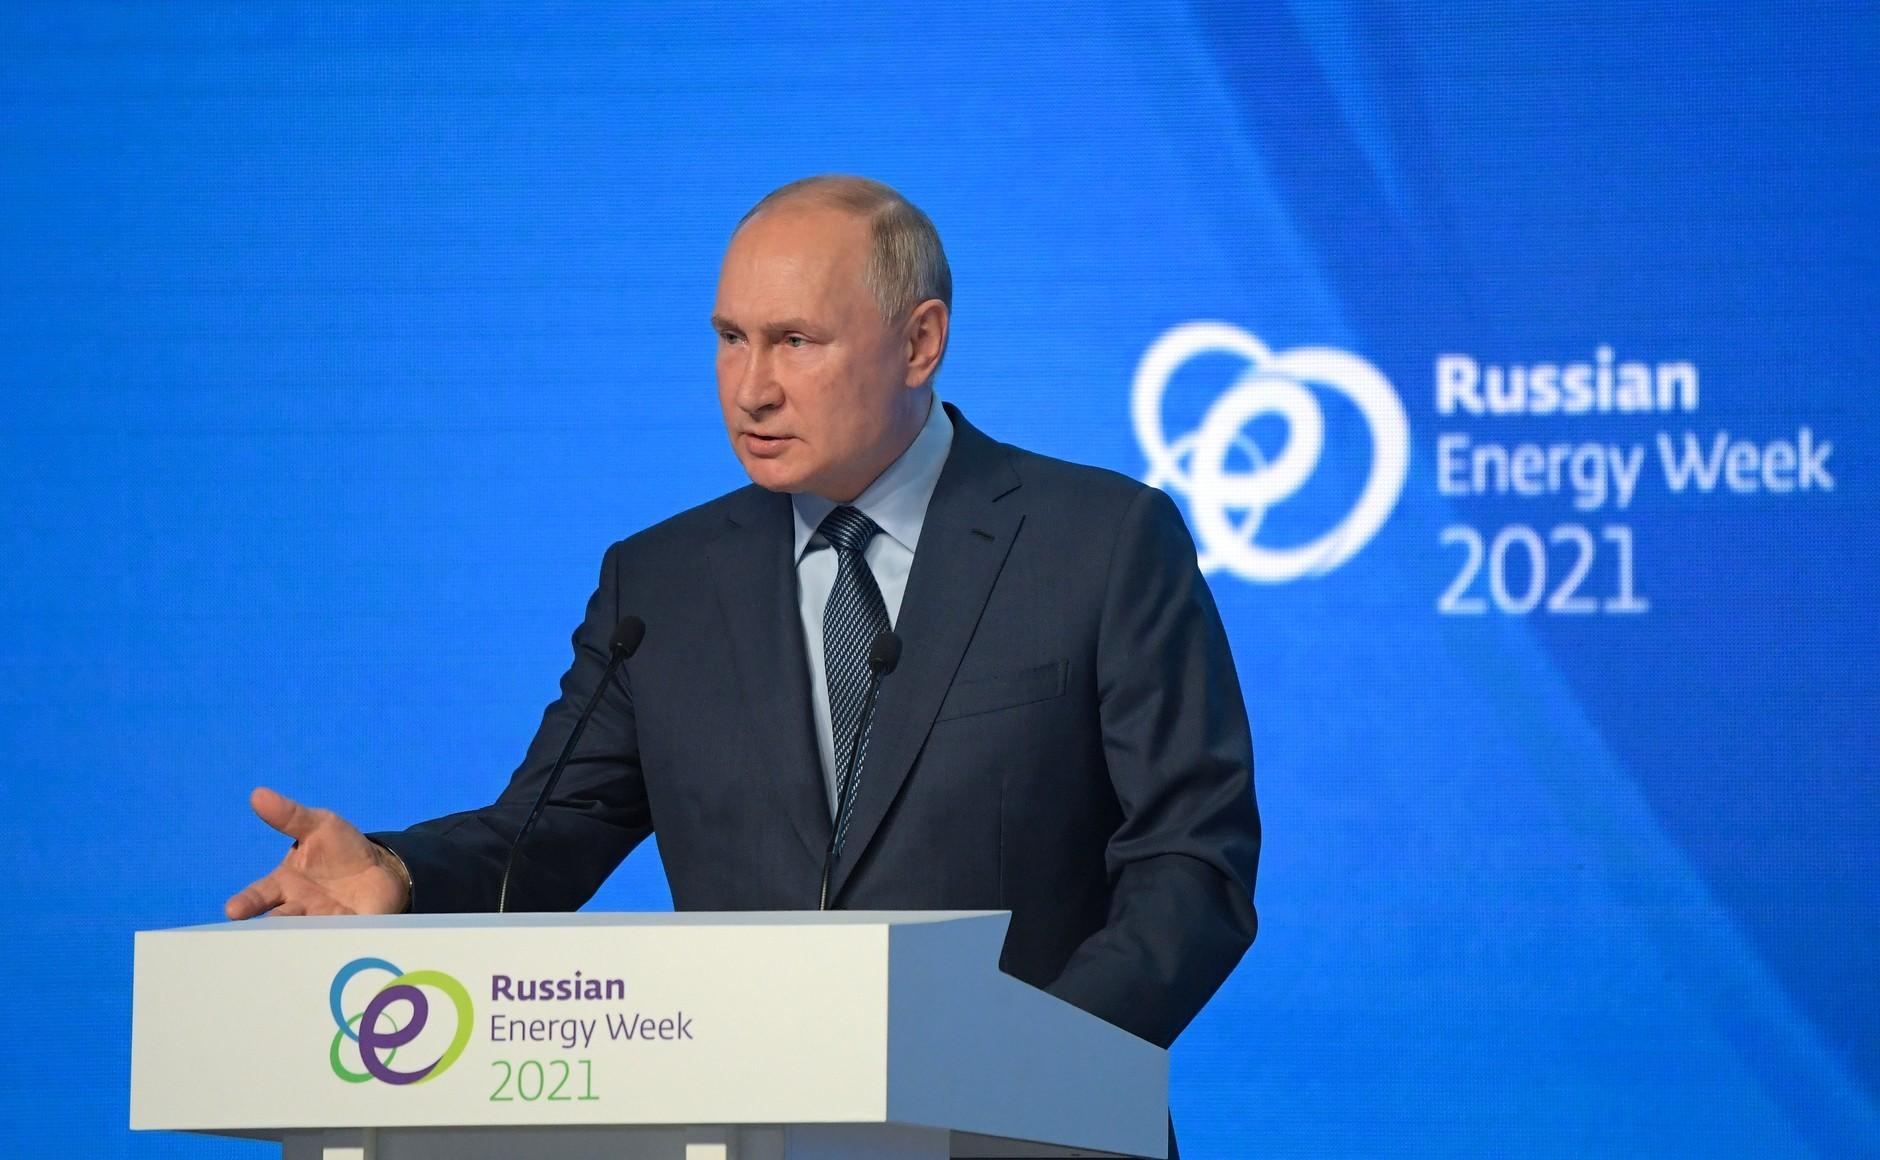 Putin Intimidates Ukraine, Blackmails EU